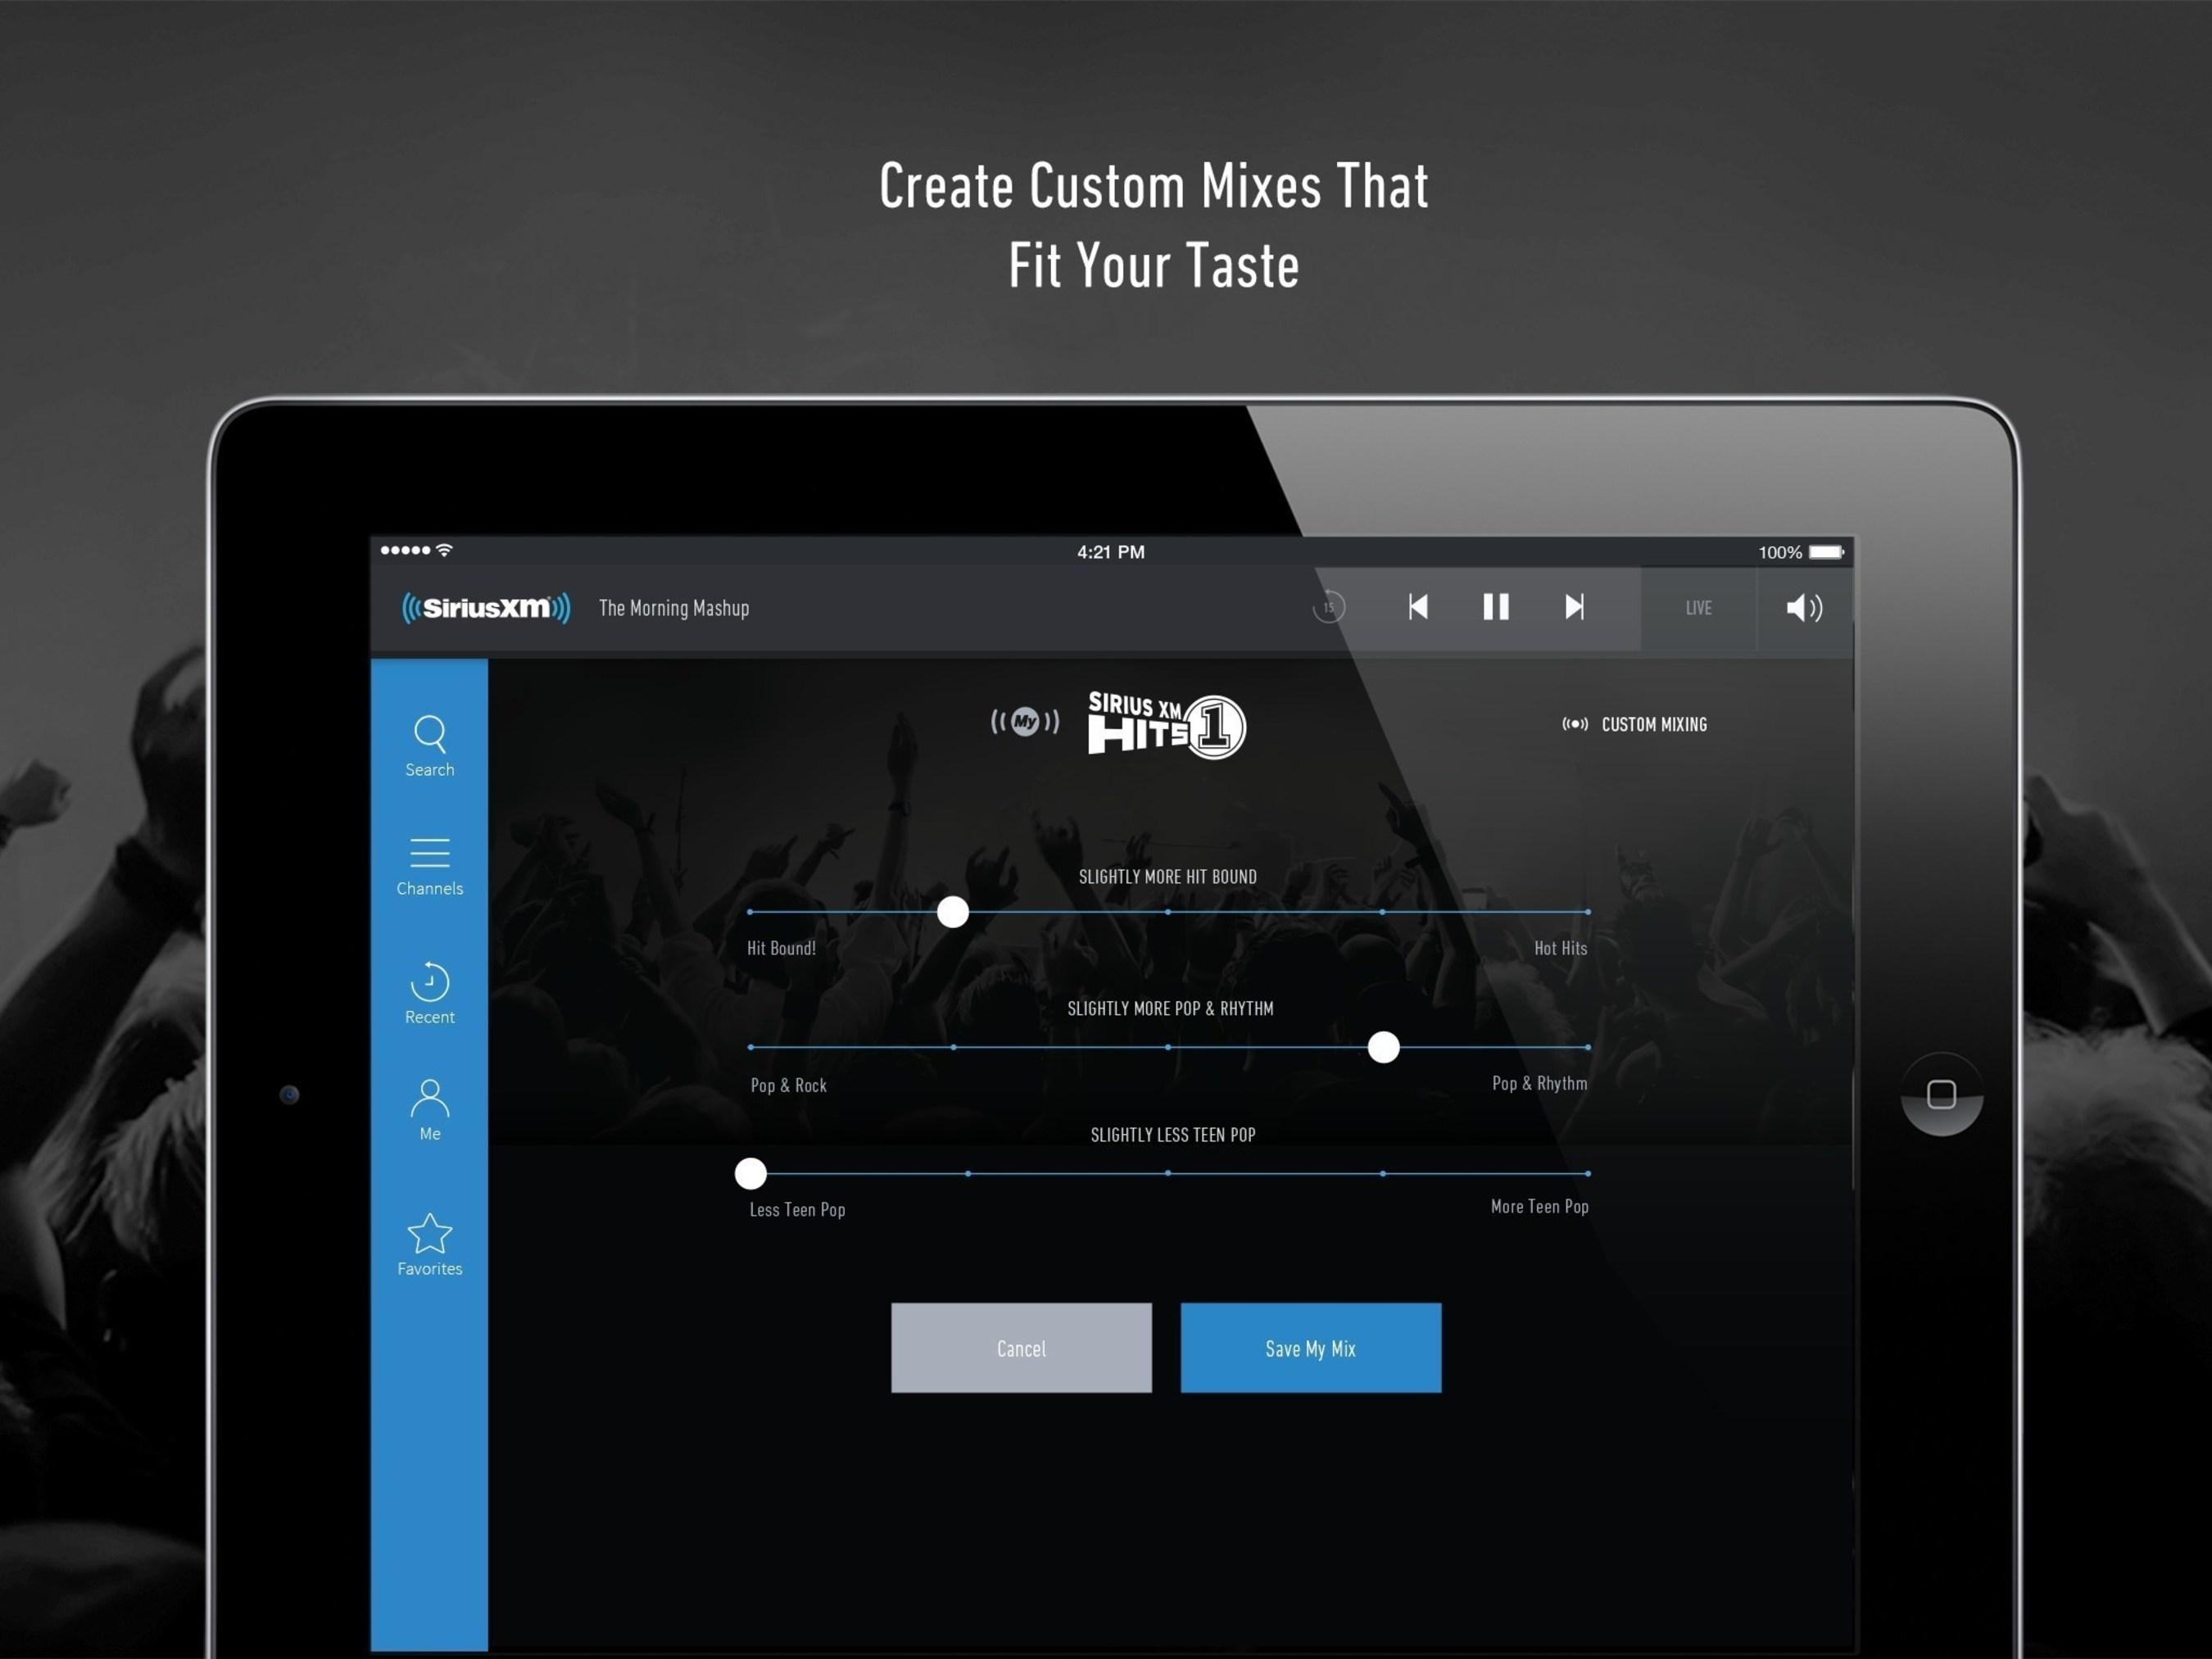 SiriusXM: Create Custom Mixes that Fit Your Taste